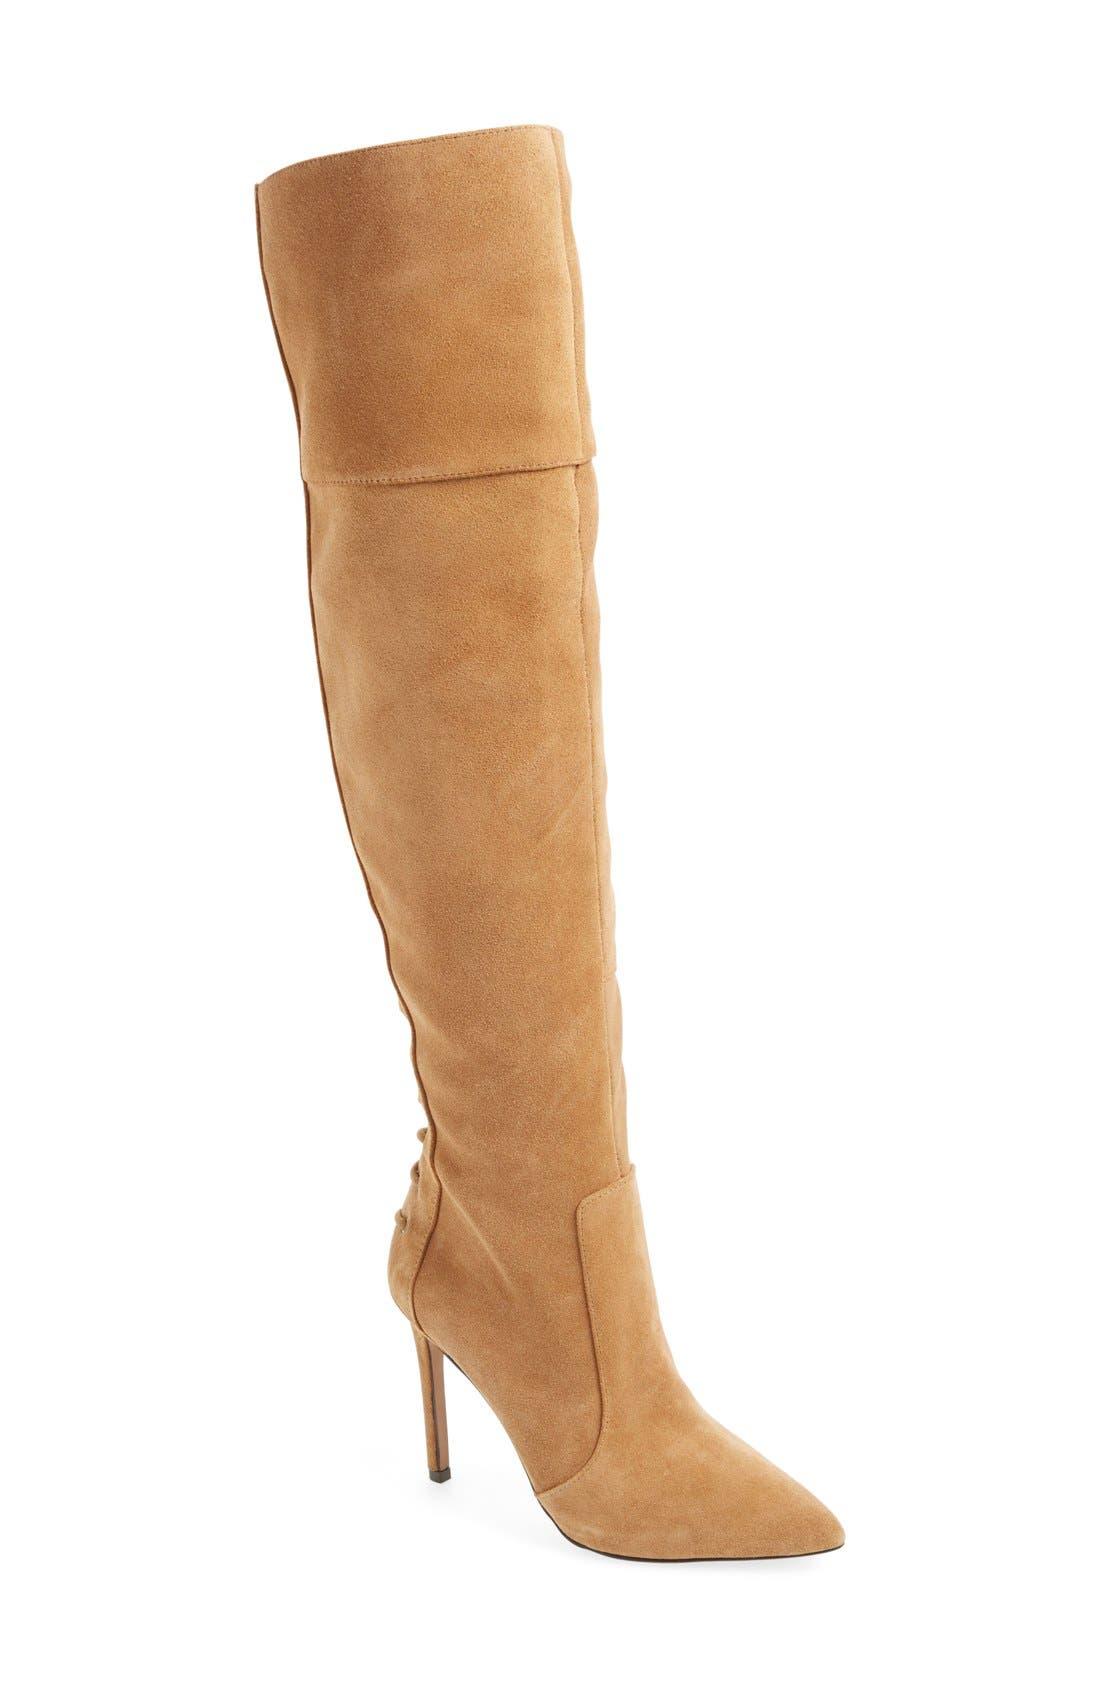 Main Image - Jessica Simpson'Parii' Over the Knee Boot (Women)